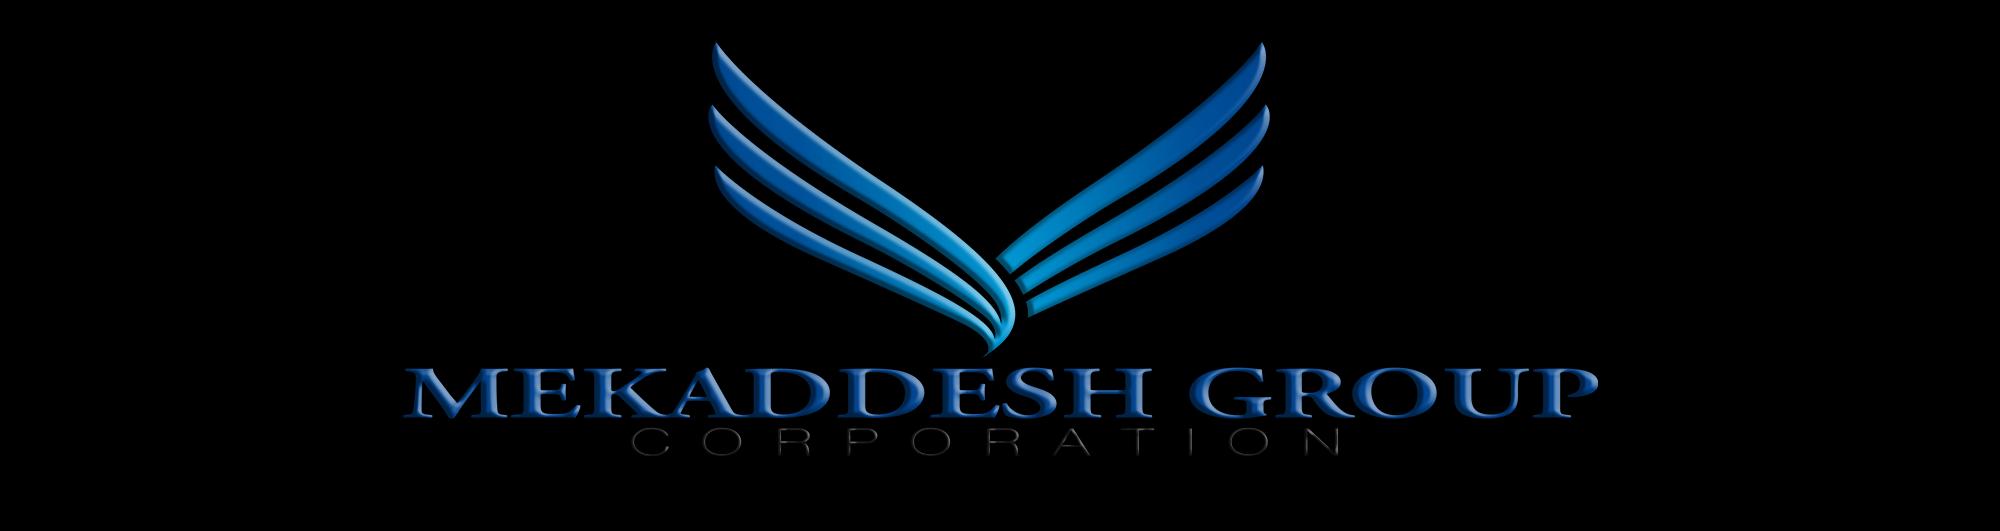 Mekaddesh group